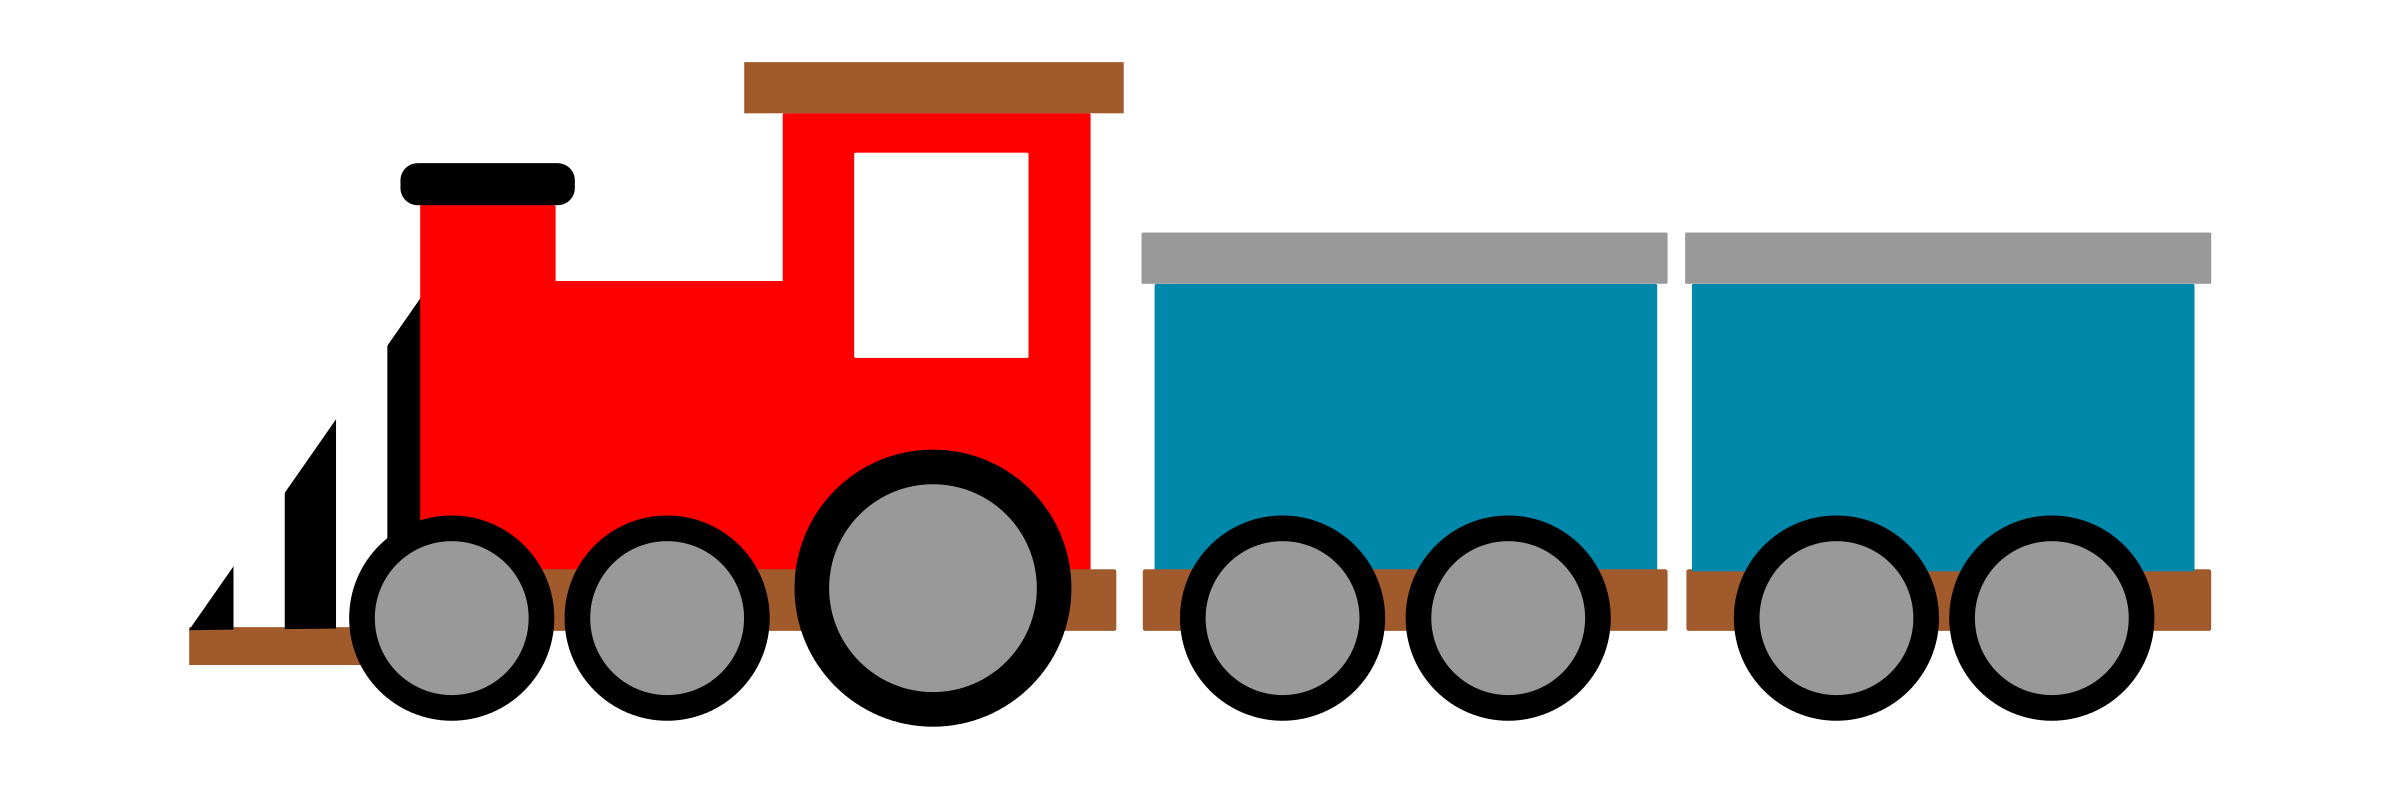 2400x790 Polar Express Train Ride Clip Art